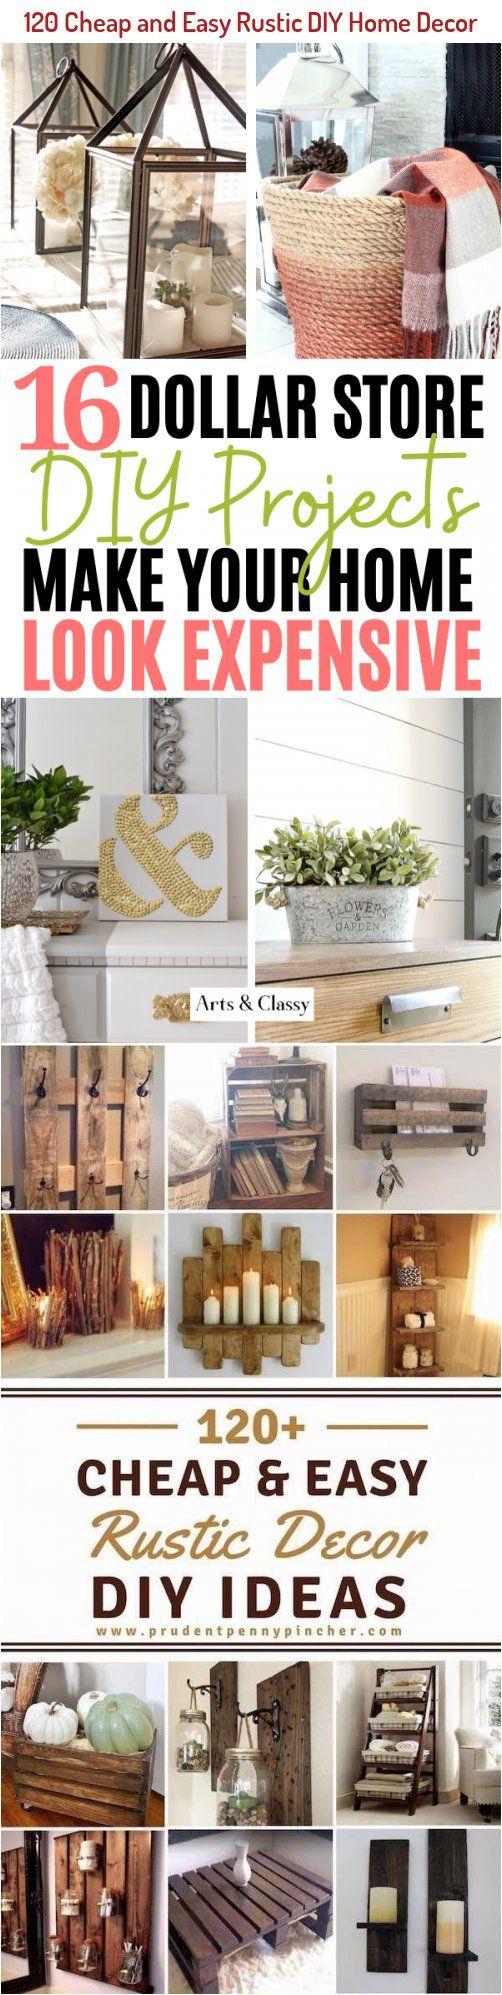 120 Cheap And Easy Diy Rustic Home Decor Ideas Diyrusticfarmhousedecor In 2020 Rustic Diy Diy Home Decor Easy Diy Home Decor